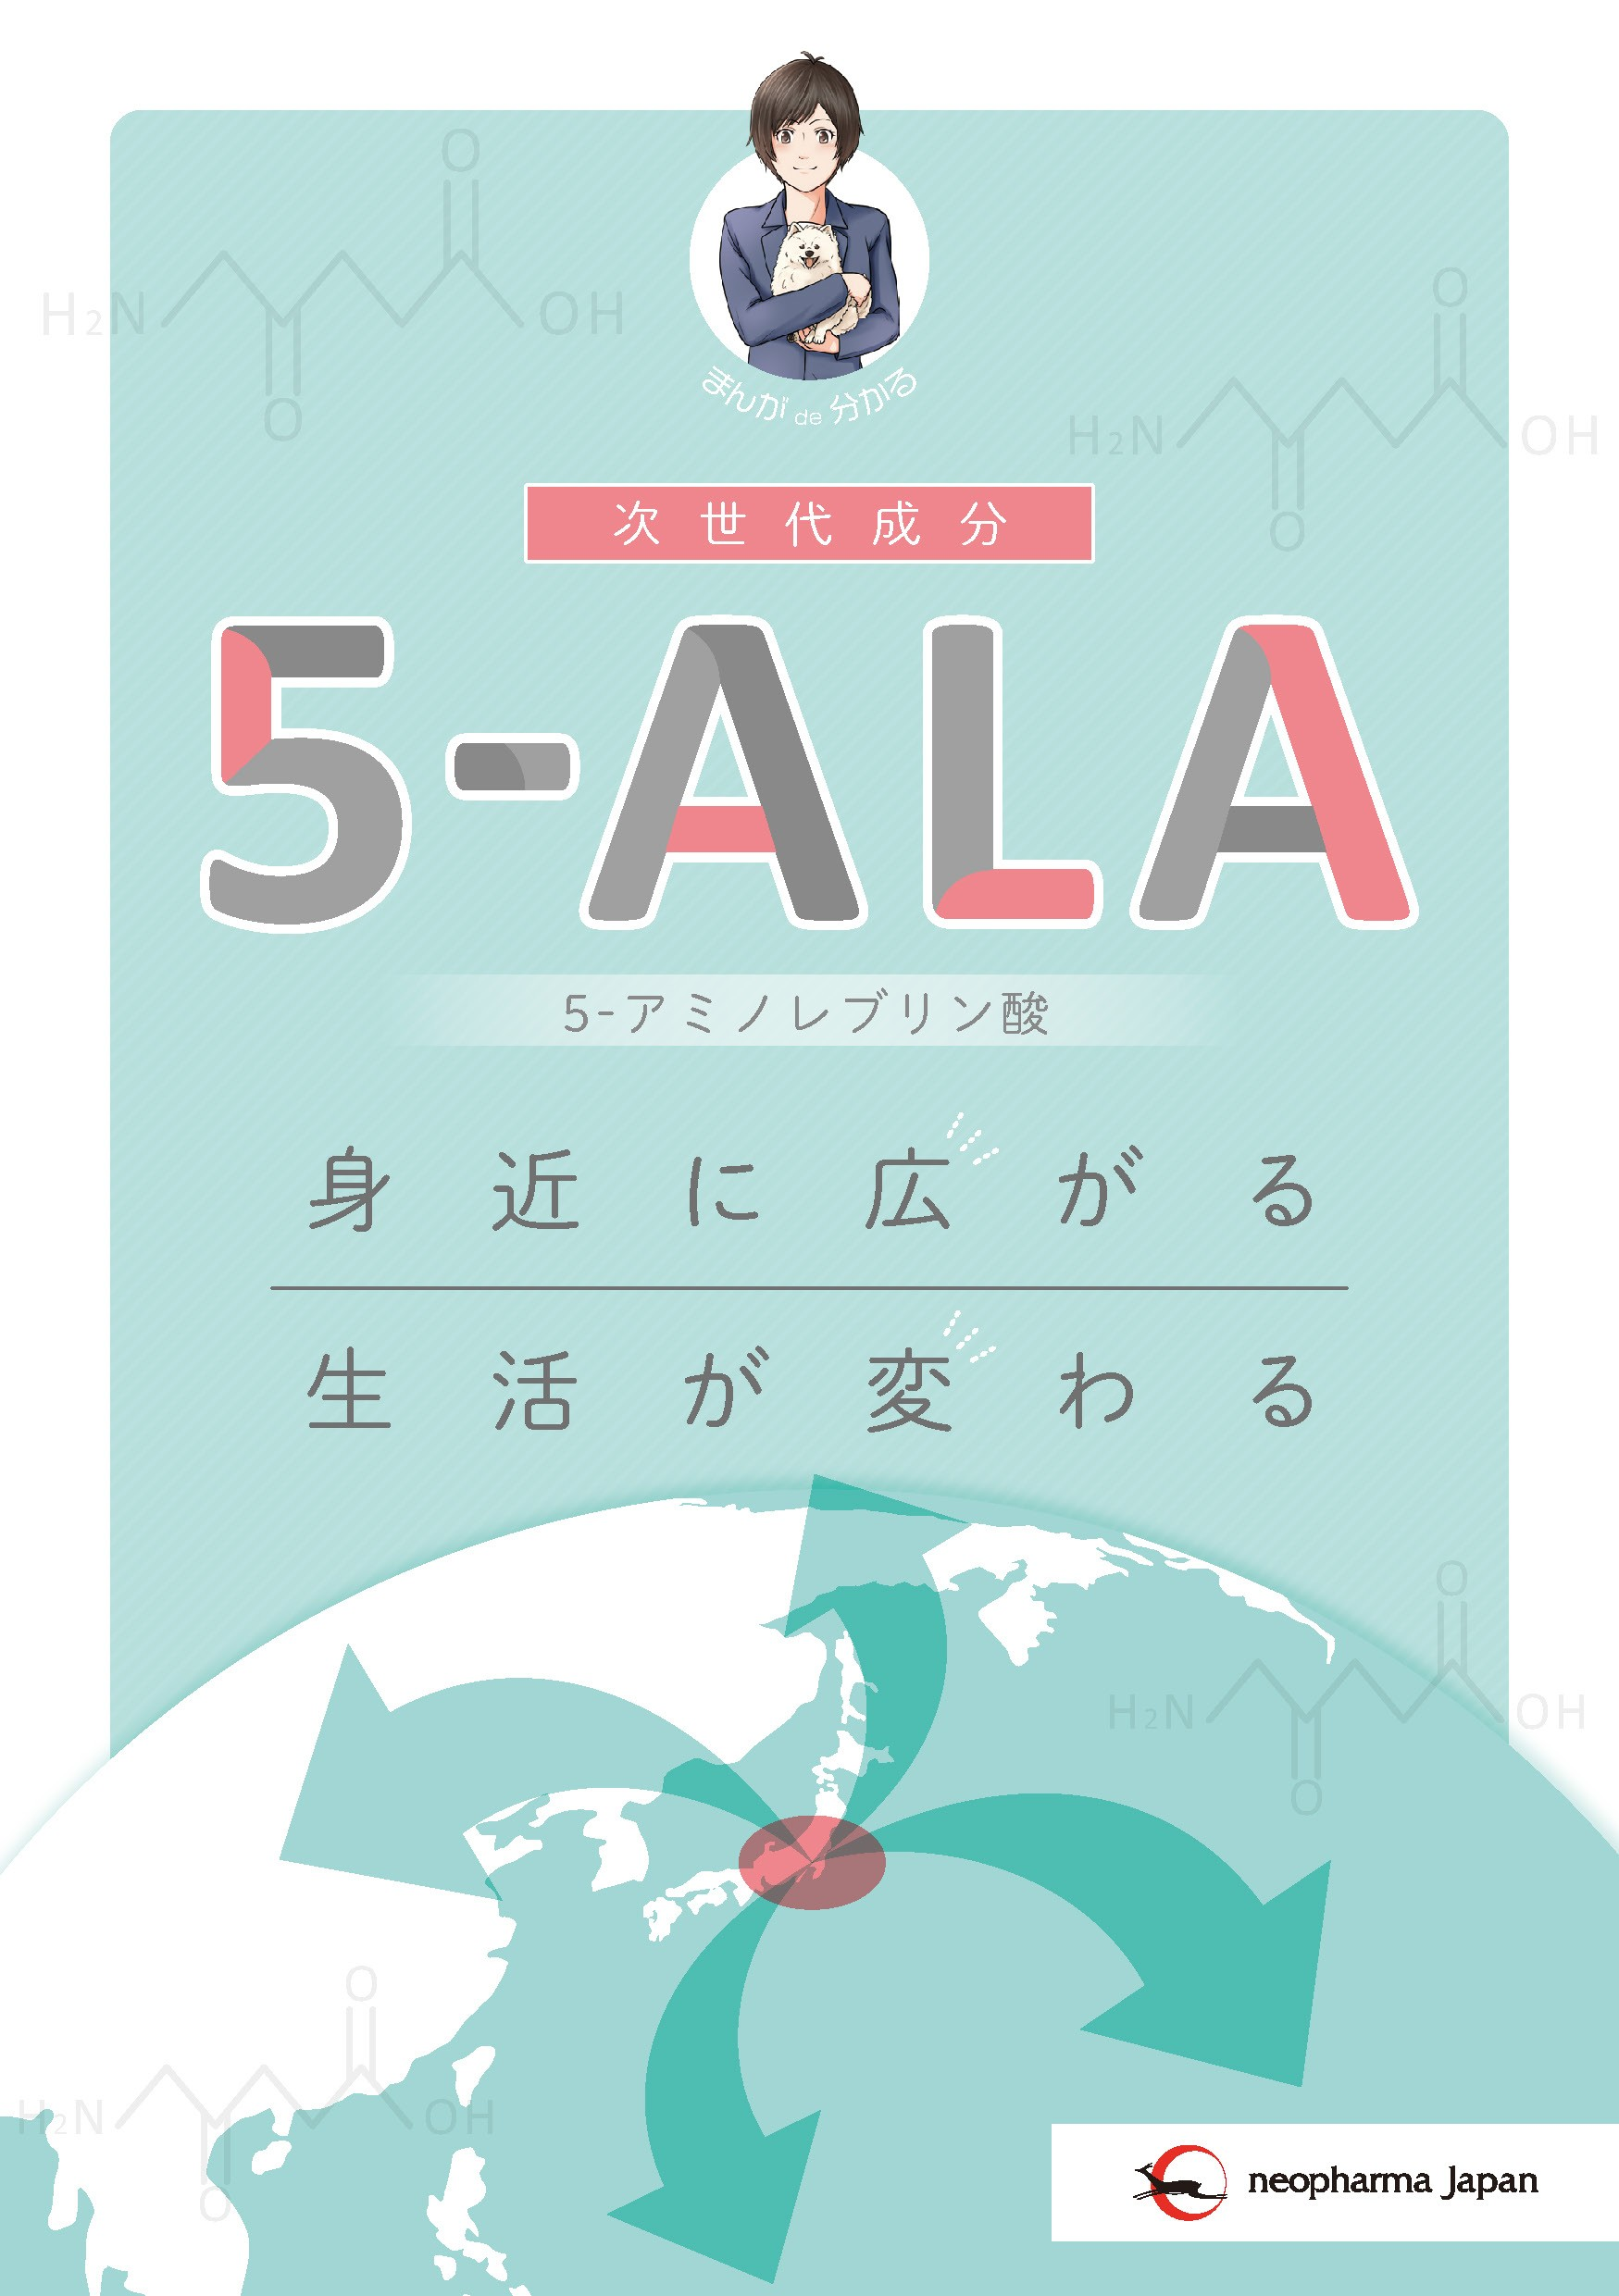 5-ALA アミノレブリン酸 - ネオファーマジャパン株式会社様 | 制作実績 ...